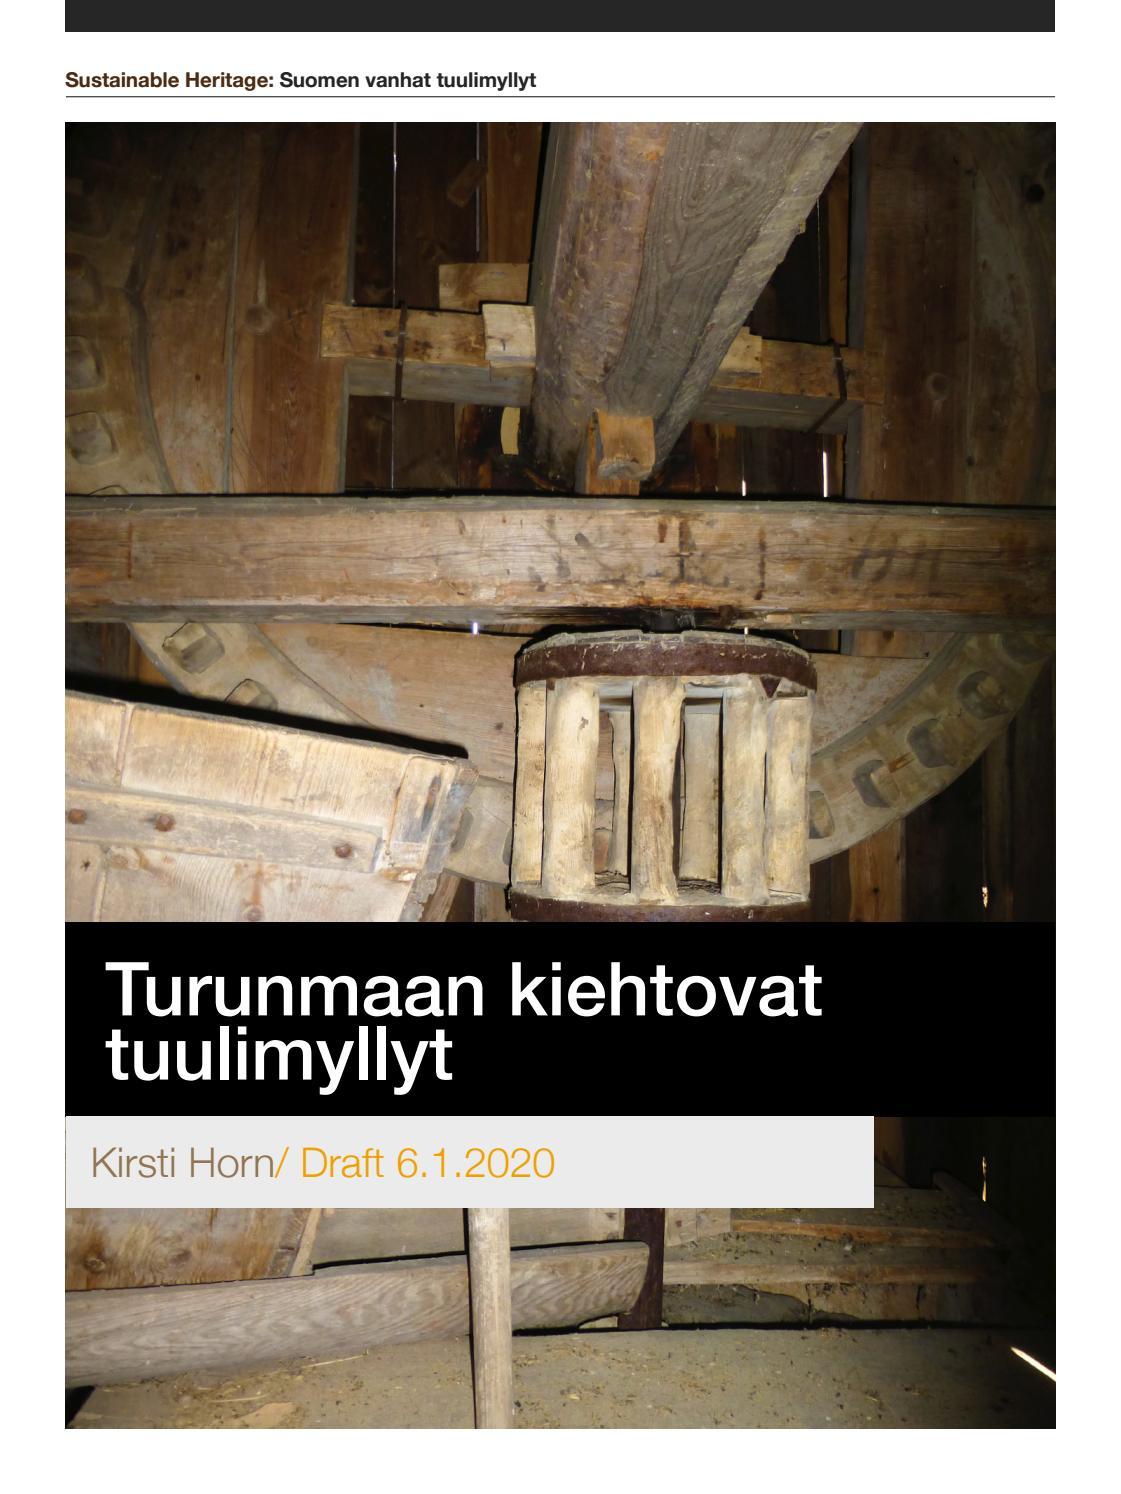 Turunmaan Kiehtovat Tuulimyllyt Kirsti Horn 2019 By ˈpʌblɪʃɪŋ